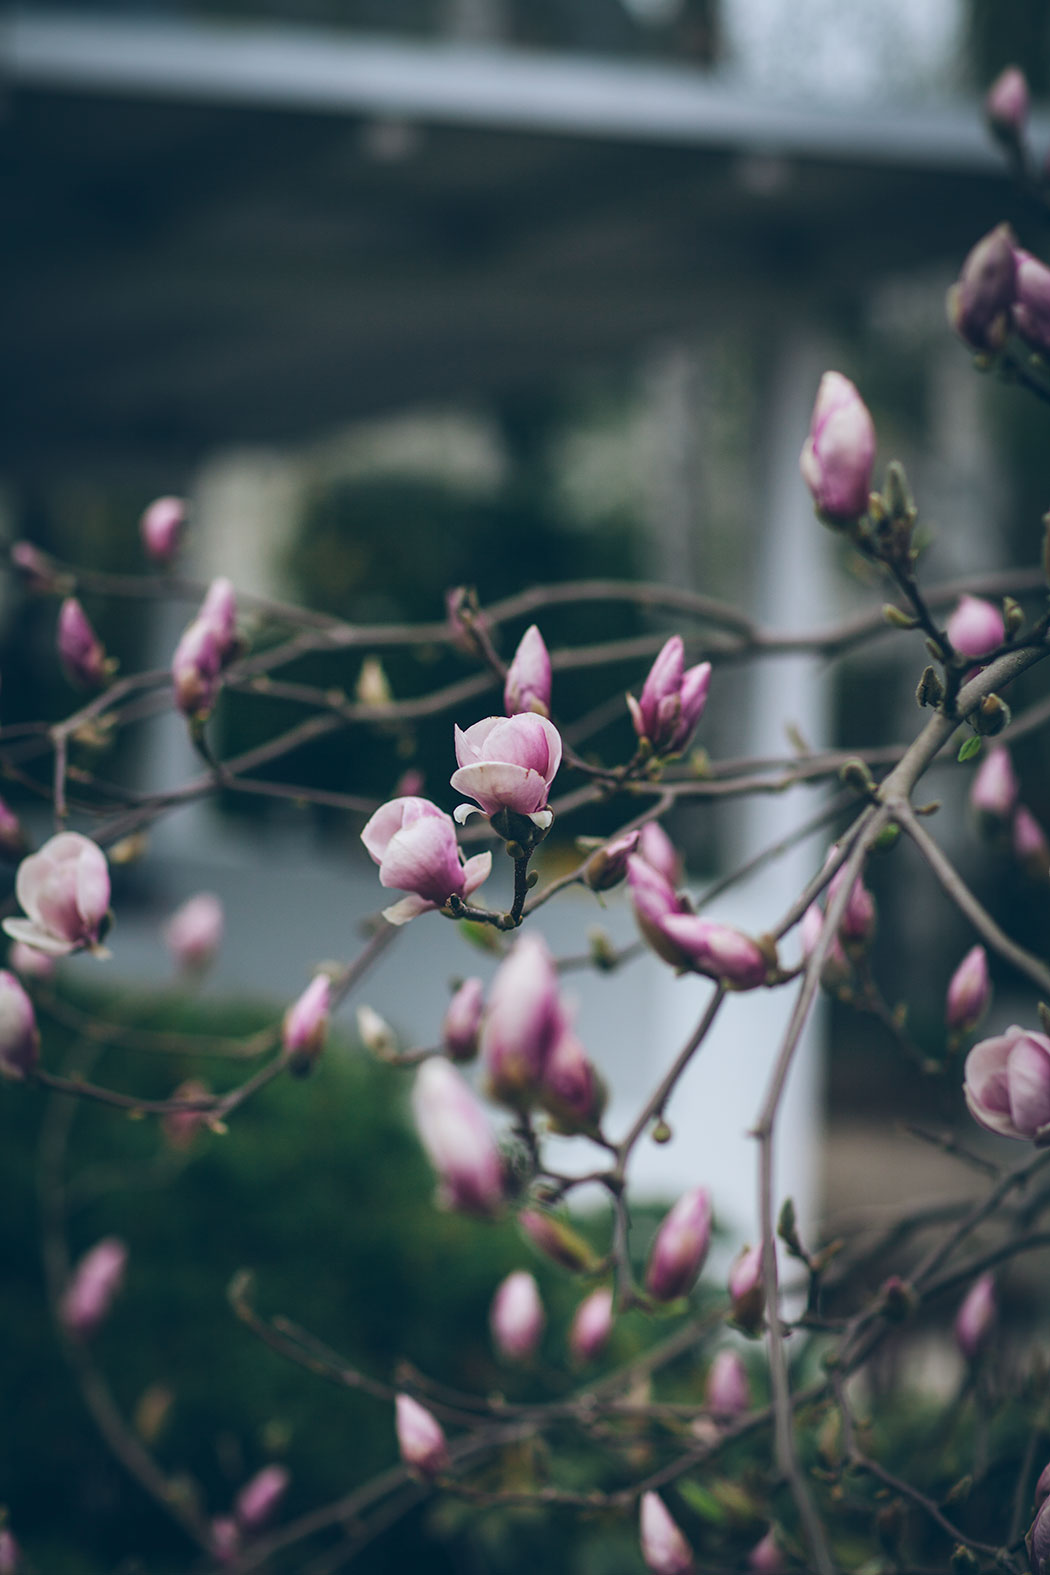 magnolia-poczatek-kwietnoa